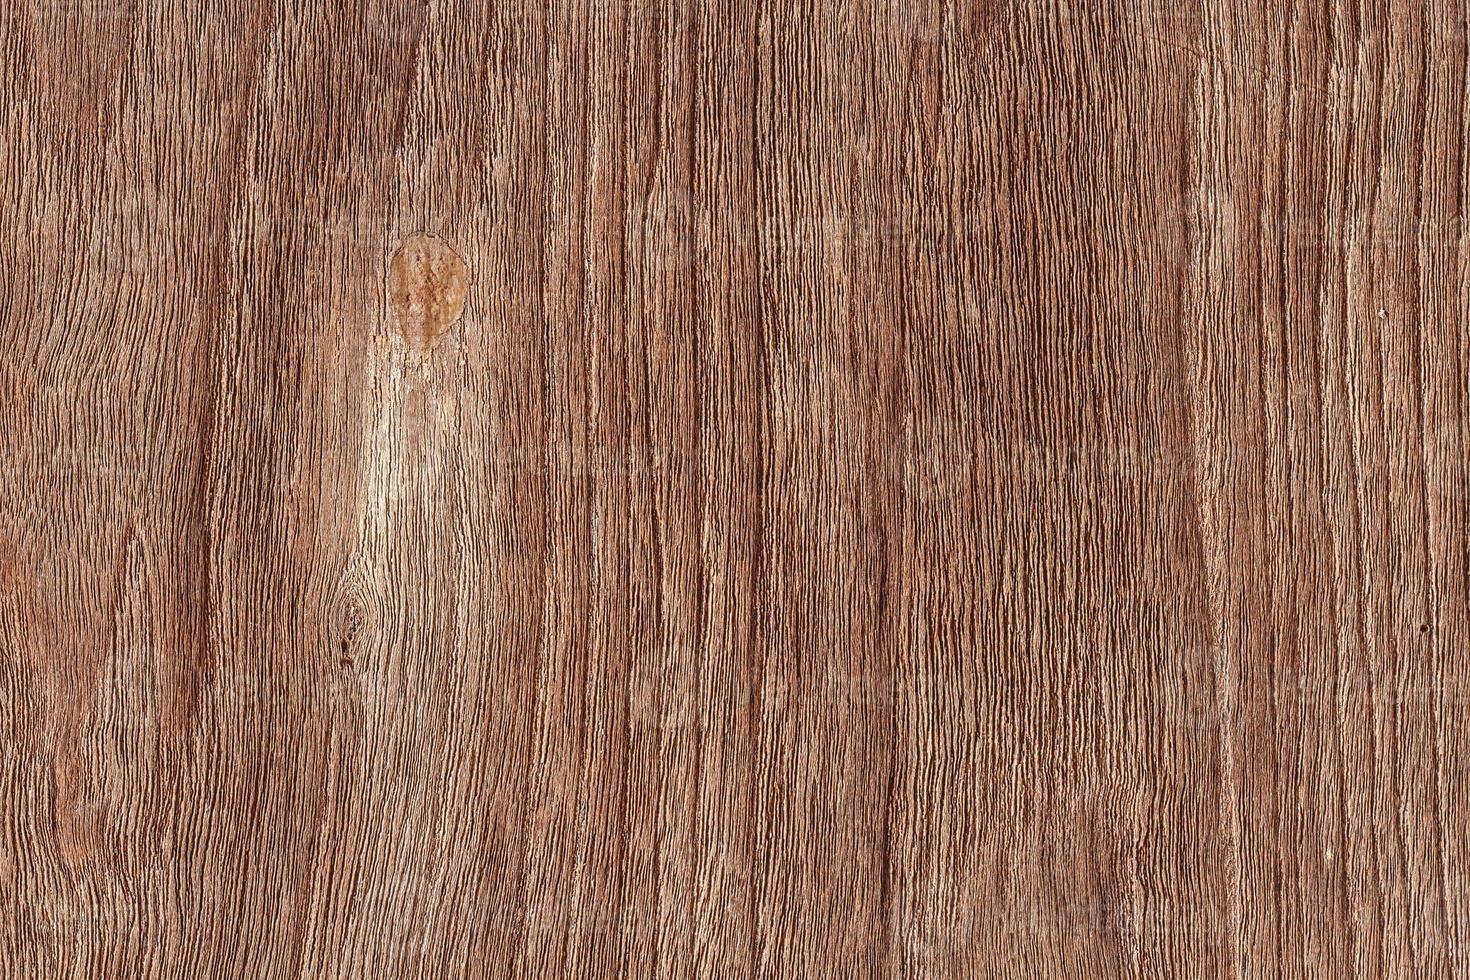 trä textur / trä textur bakgrund foto